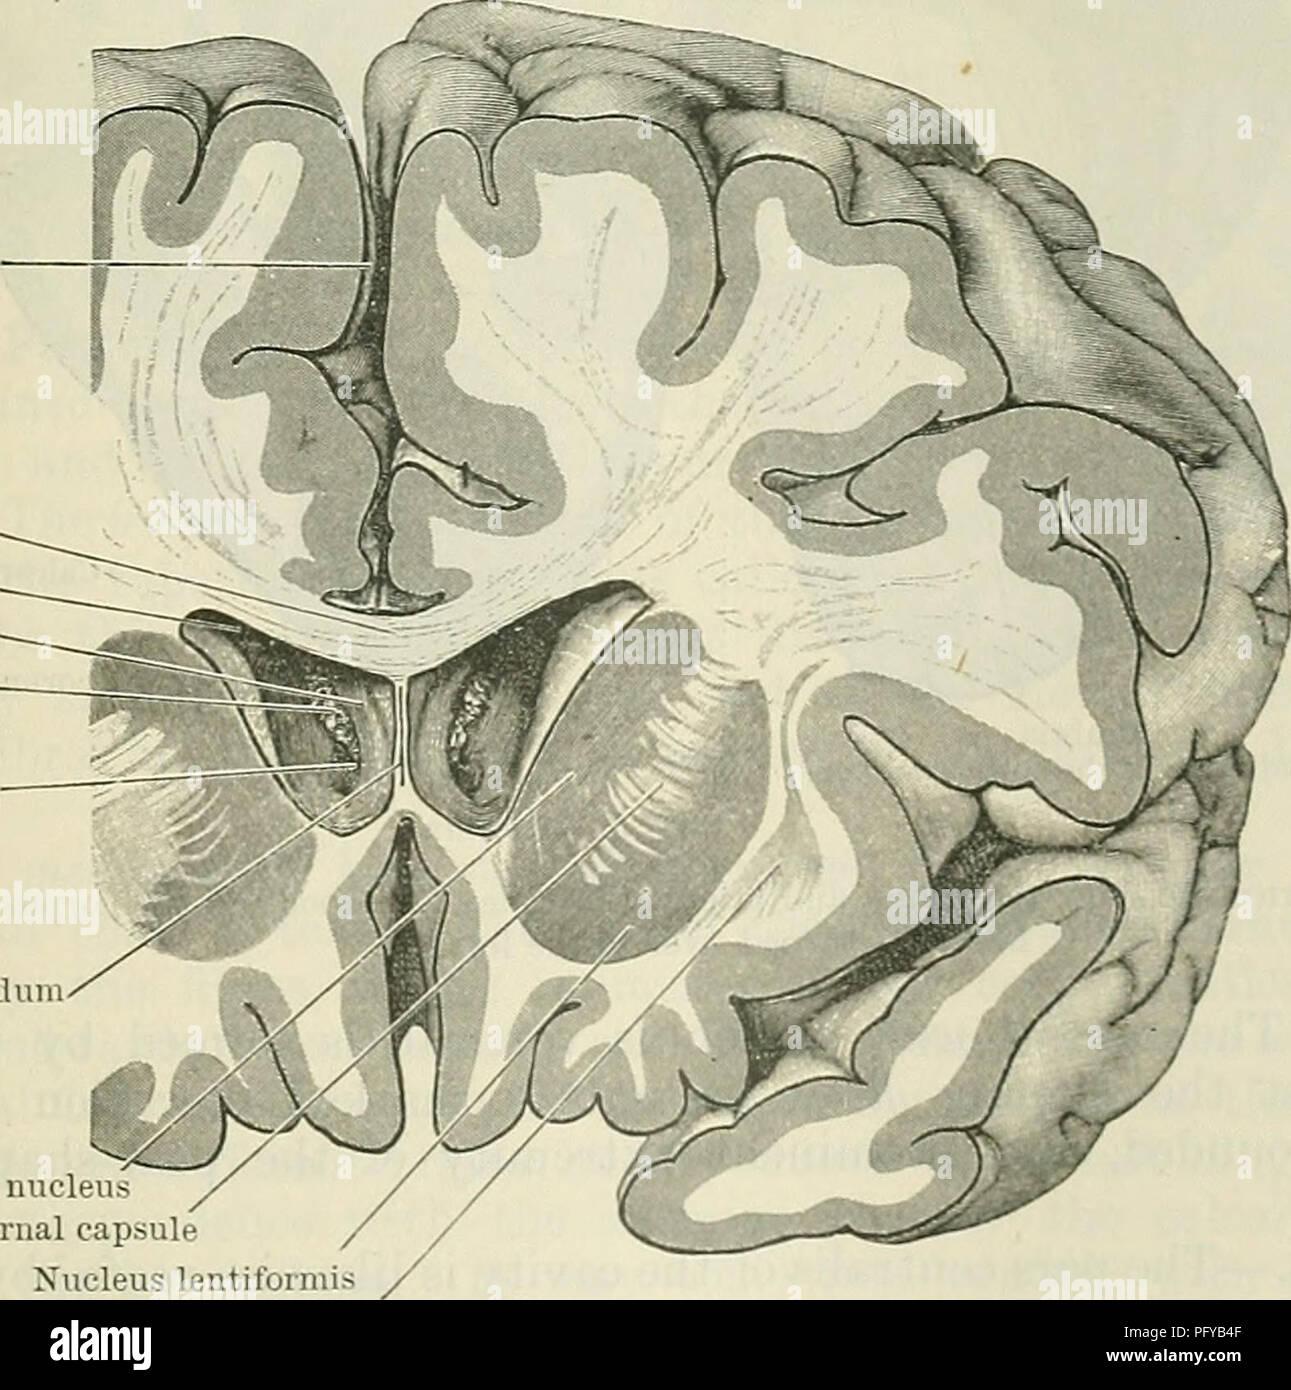 Cunninghams Lehrbuch der Anatomie. Anatomie. Längs- riss Corpus ...